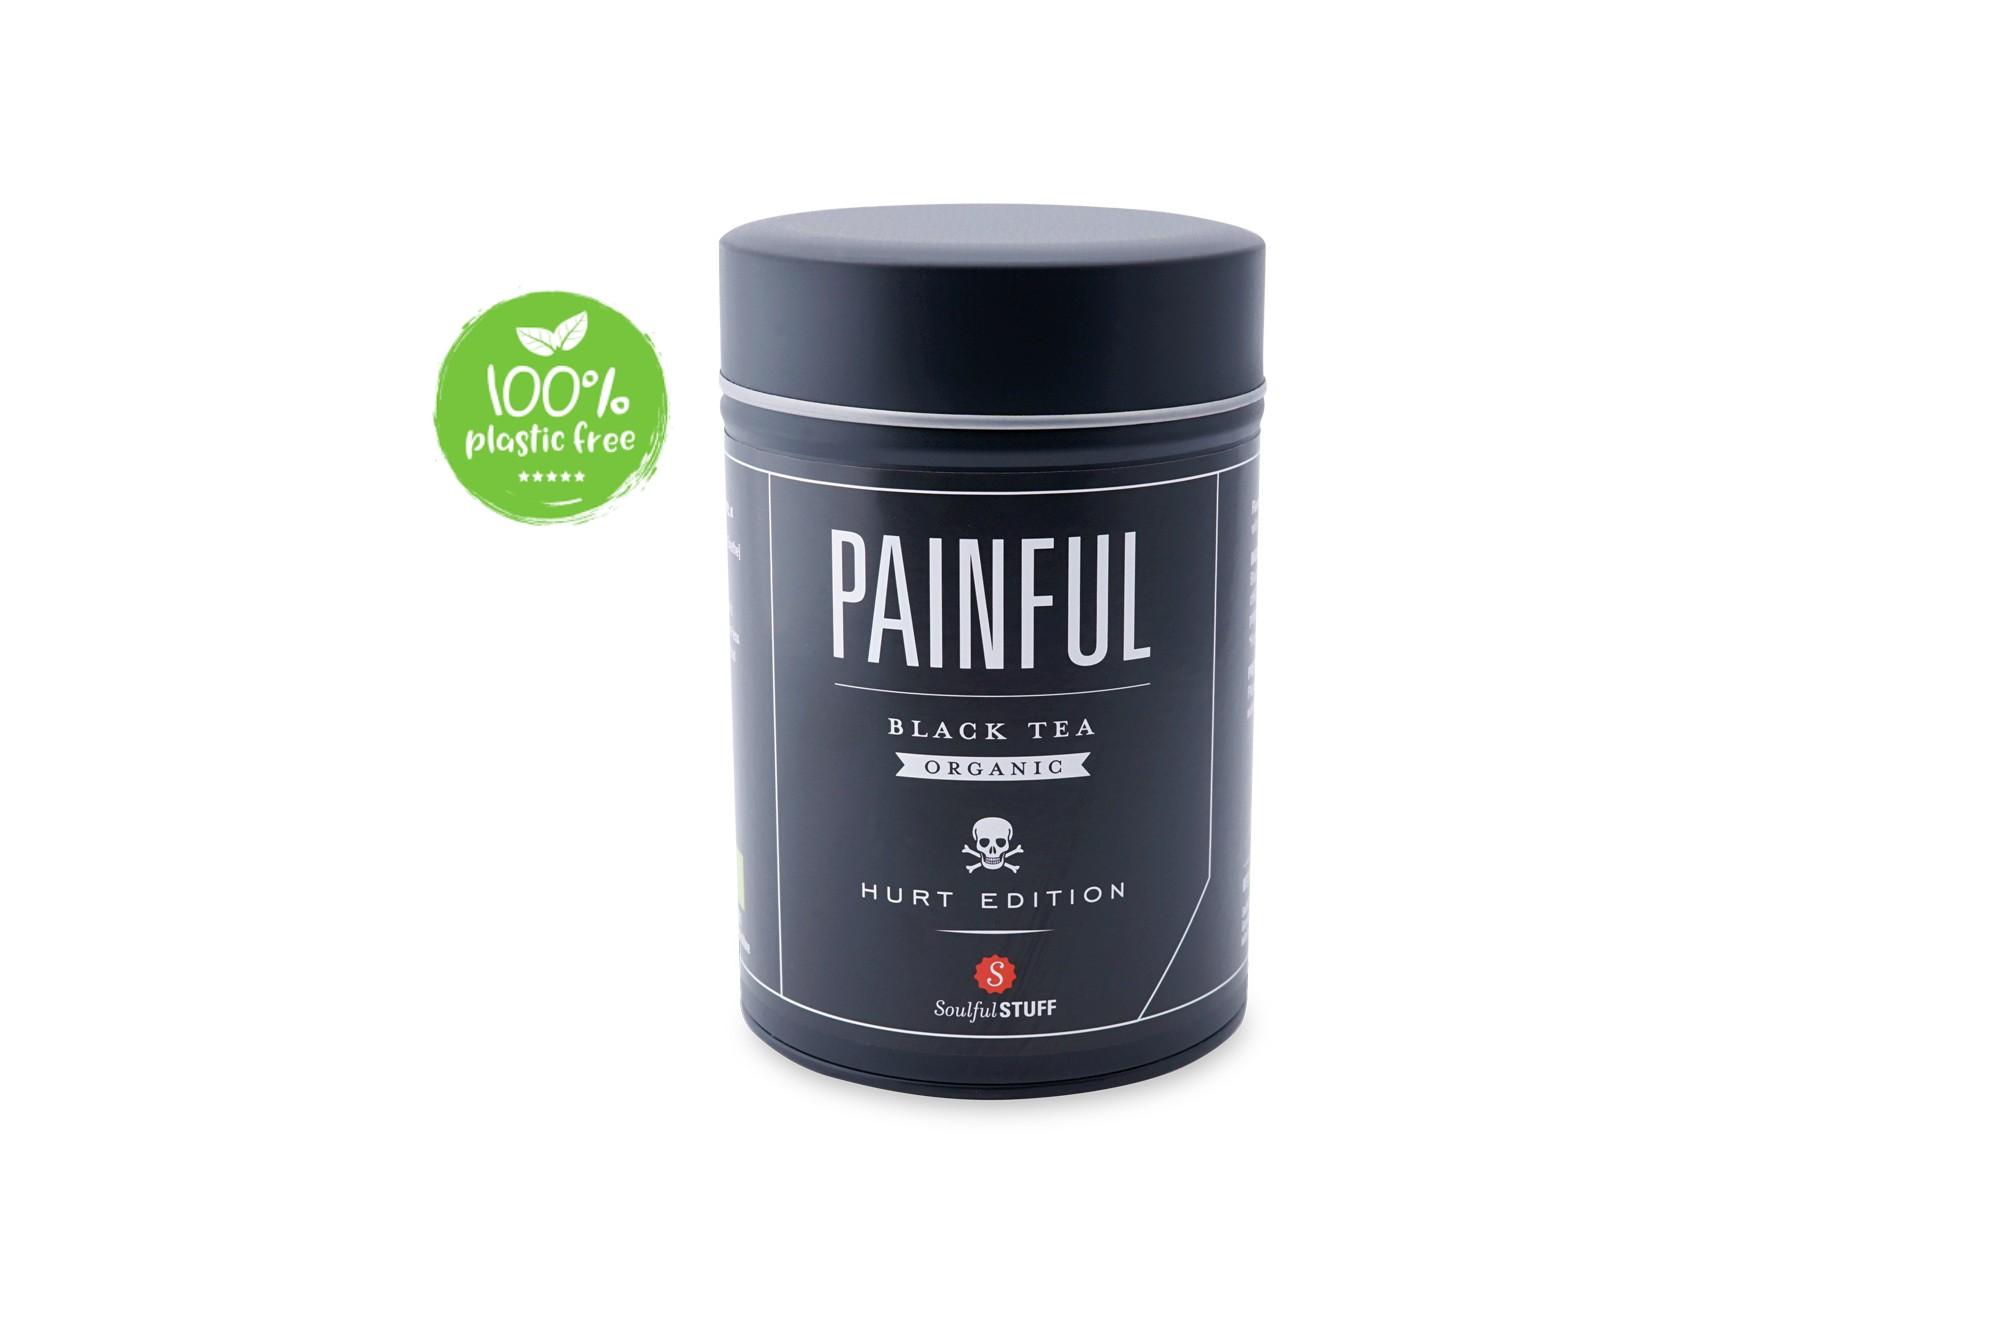 Painful Black Tea Organic Blik 160gr. Intertee